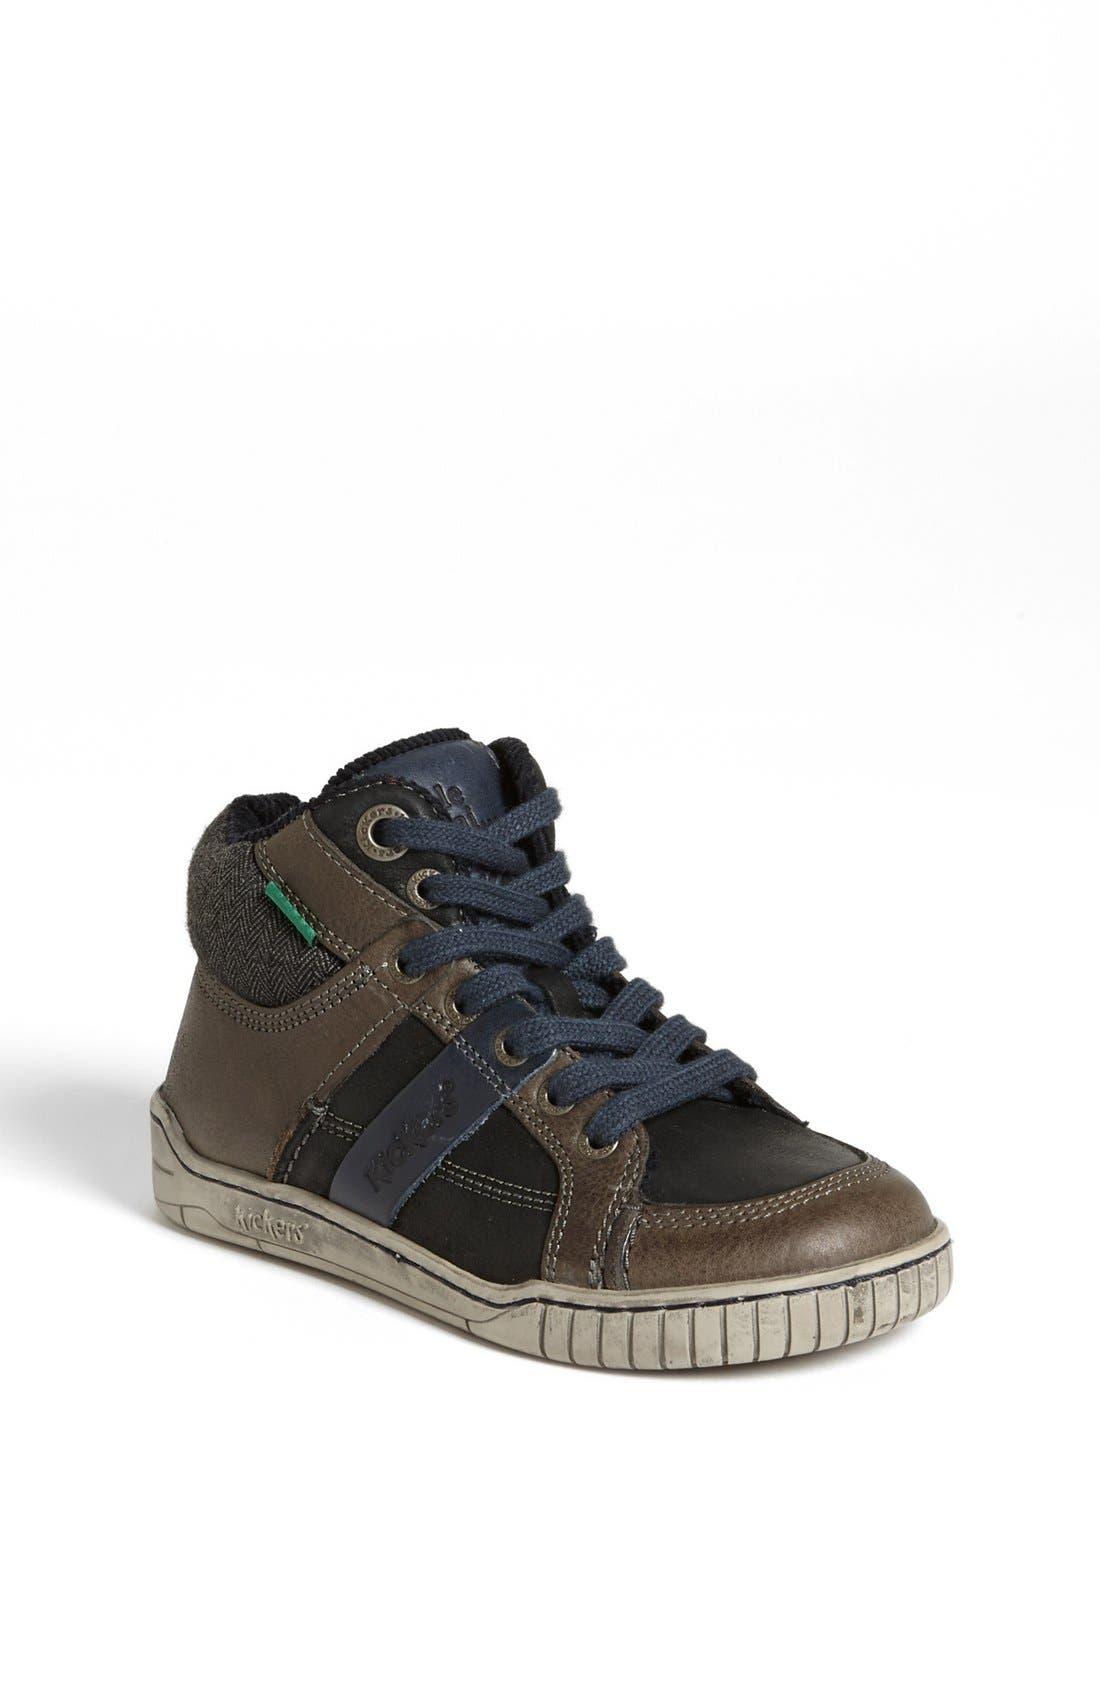 Main Image - Kickers 'Wincut' Sneaker (Toddler, Little Kid & Big Kid)